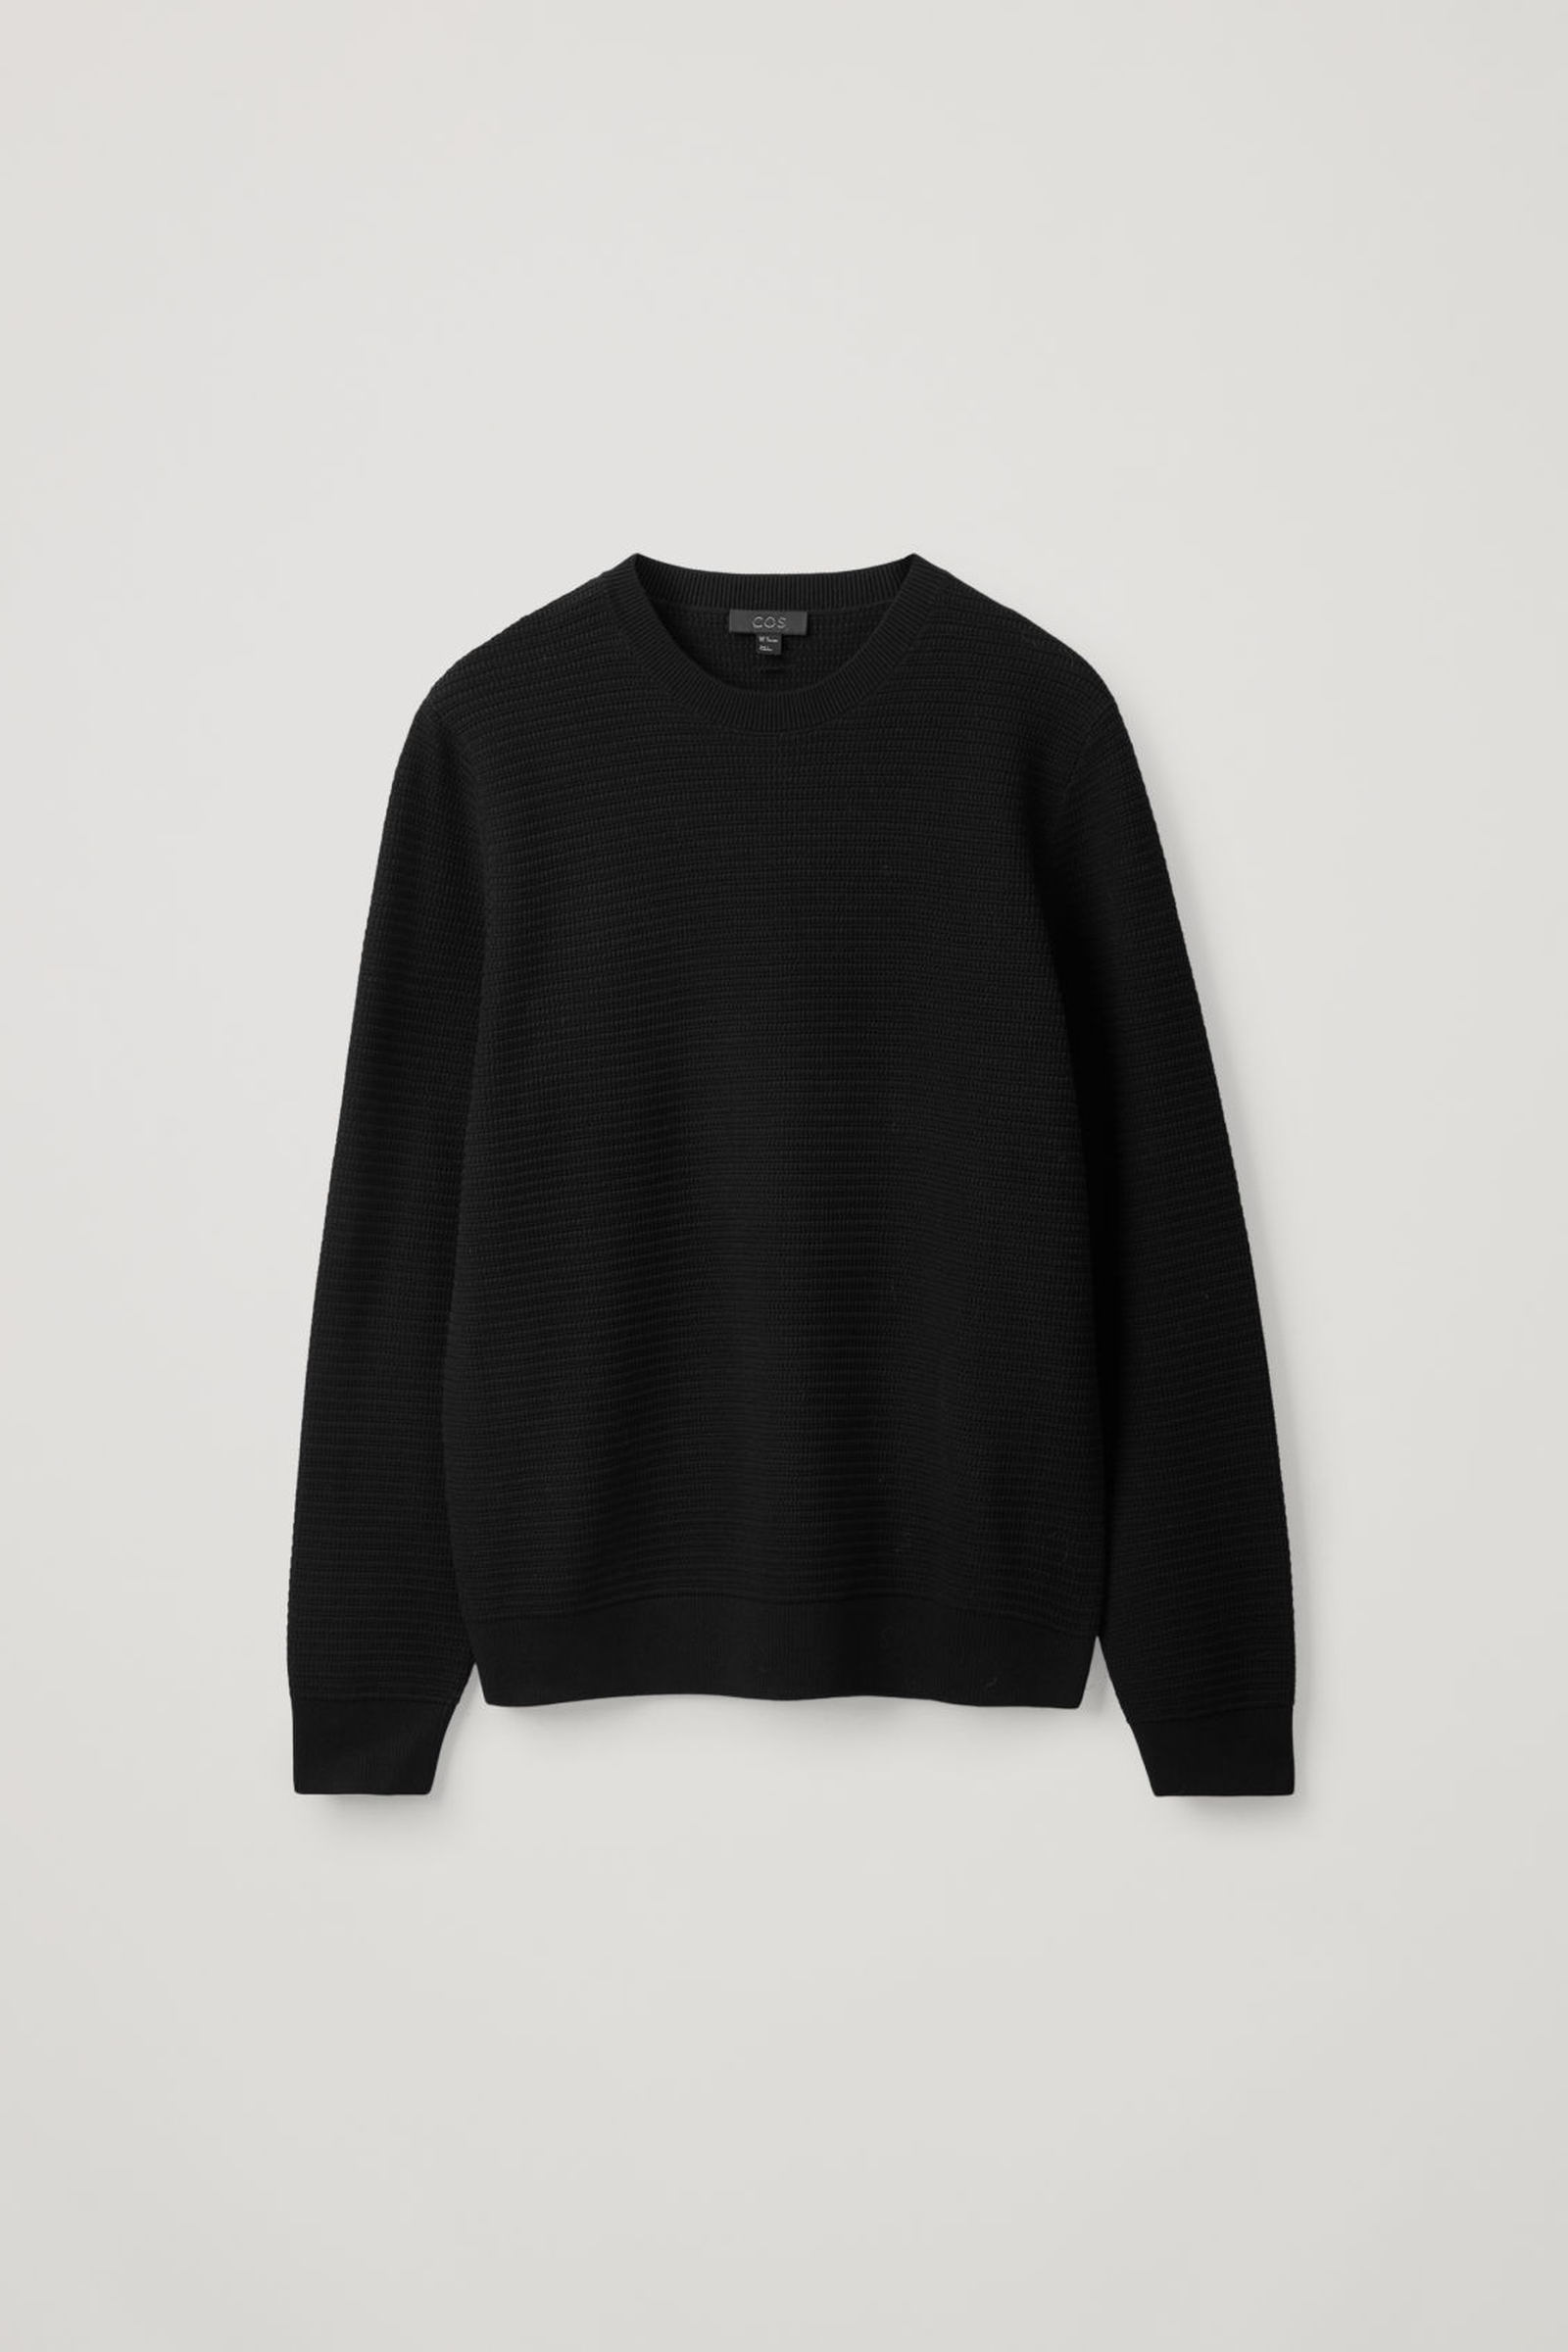 COS 텍스처드 니트 스웨터의 블랙컬러 Product입니다.